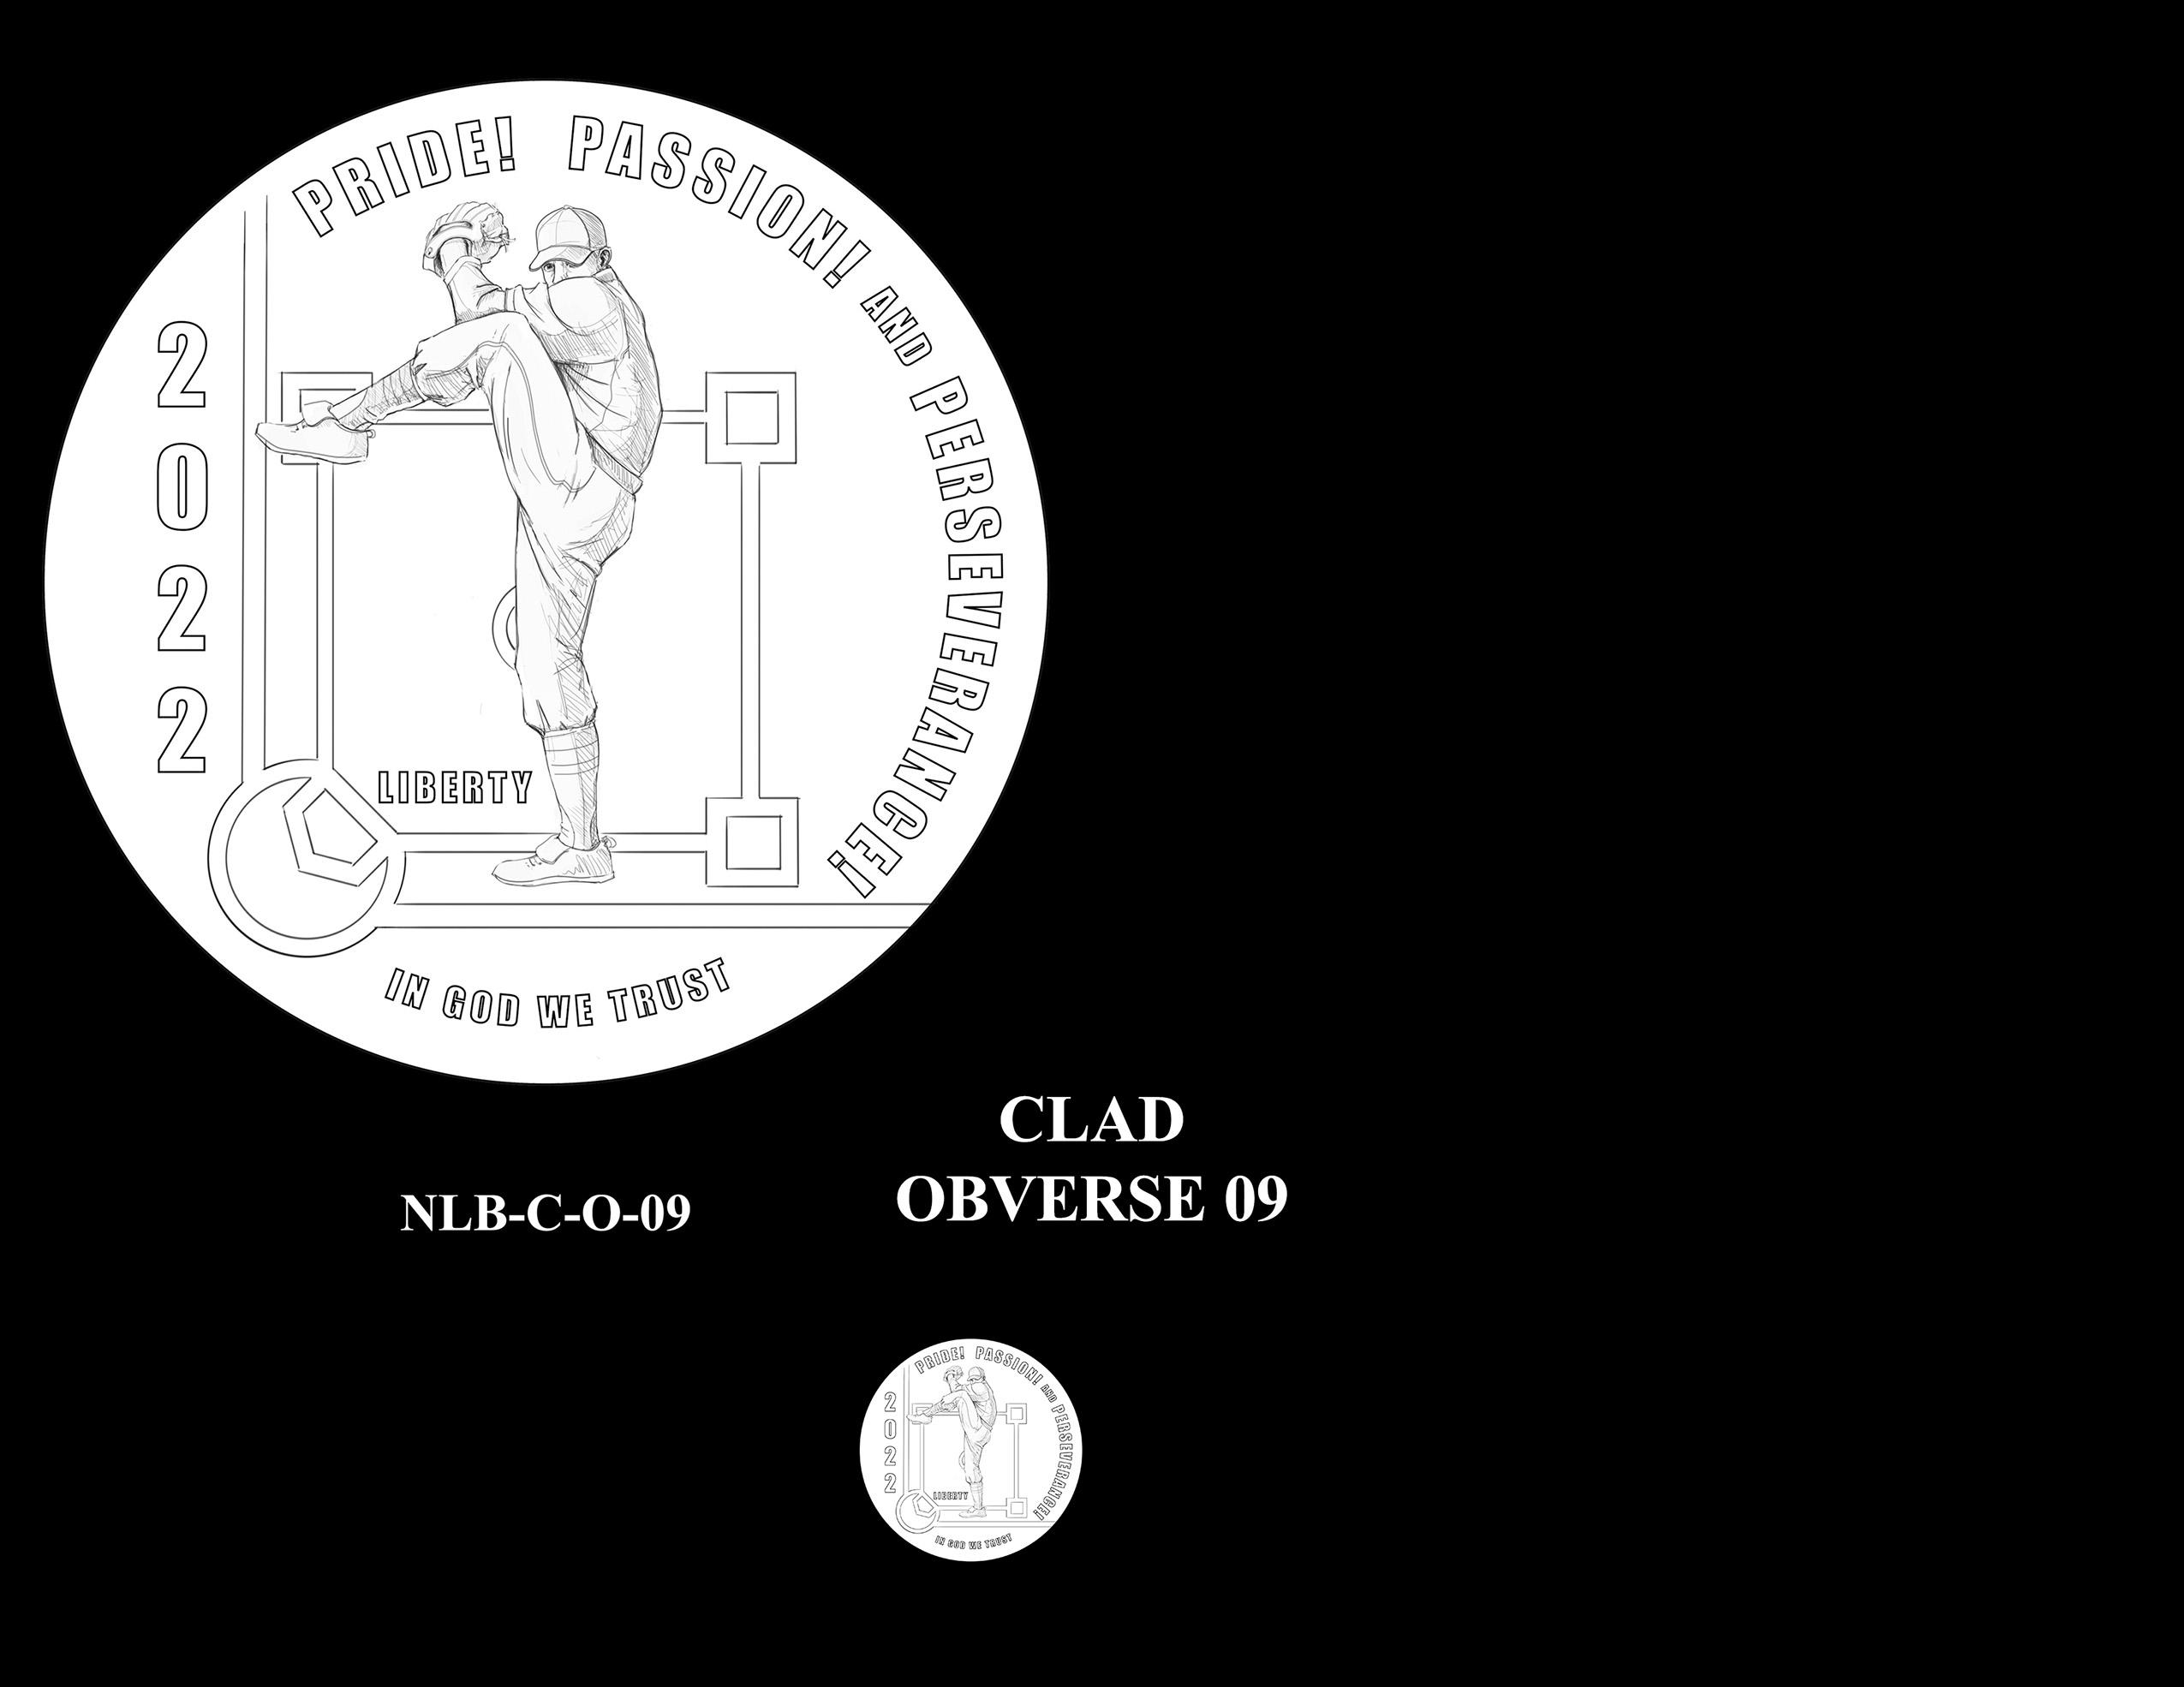 Clad Pair 09 -- Negro Leagues Baseball Commemorative Coin Program